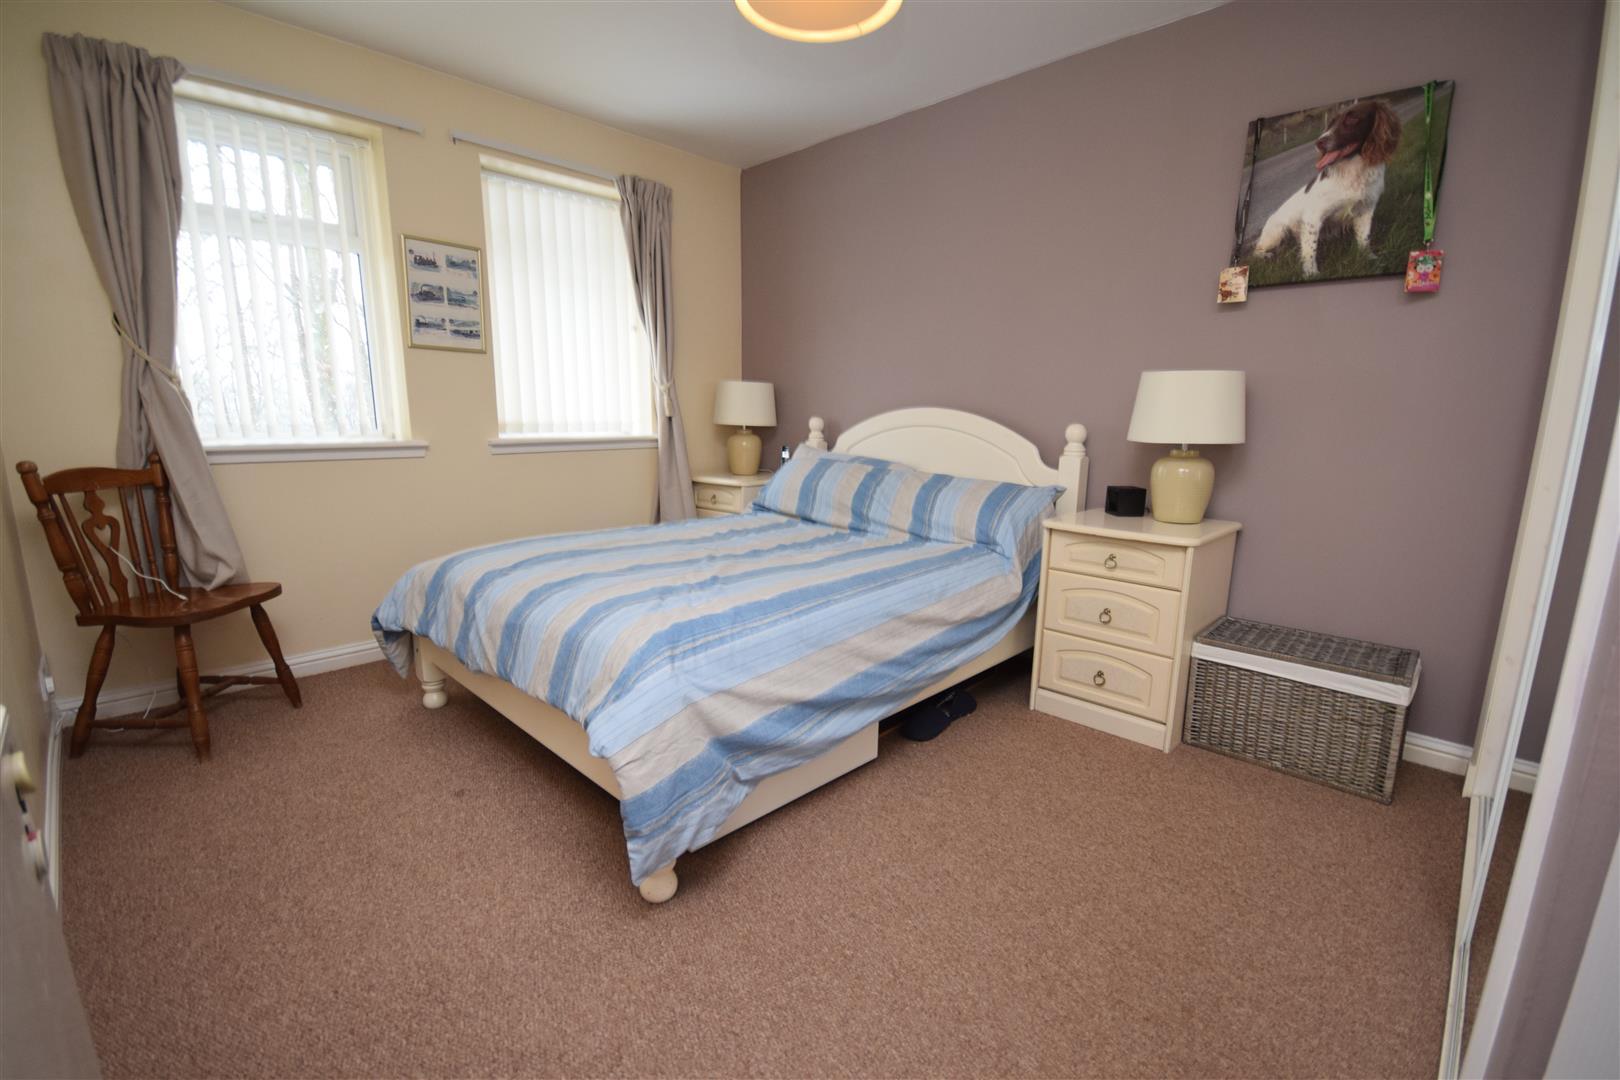 1A Sunnybank, Ballinluig, Pitlochry, Perthshire, PH9 0LG, UK